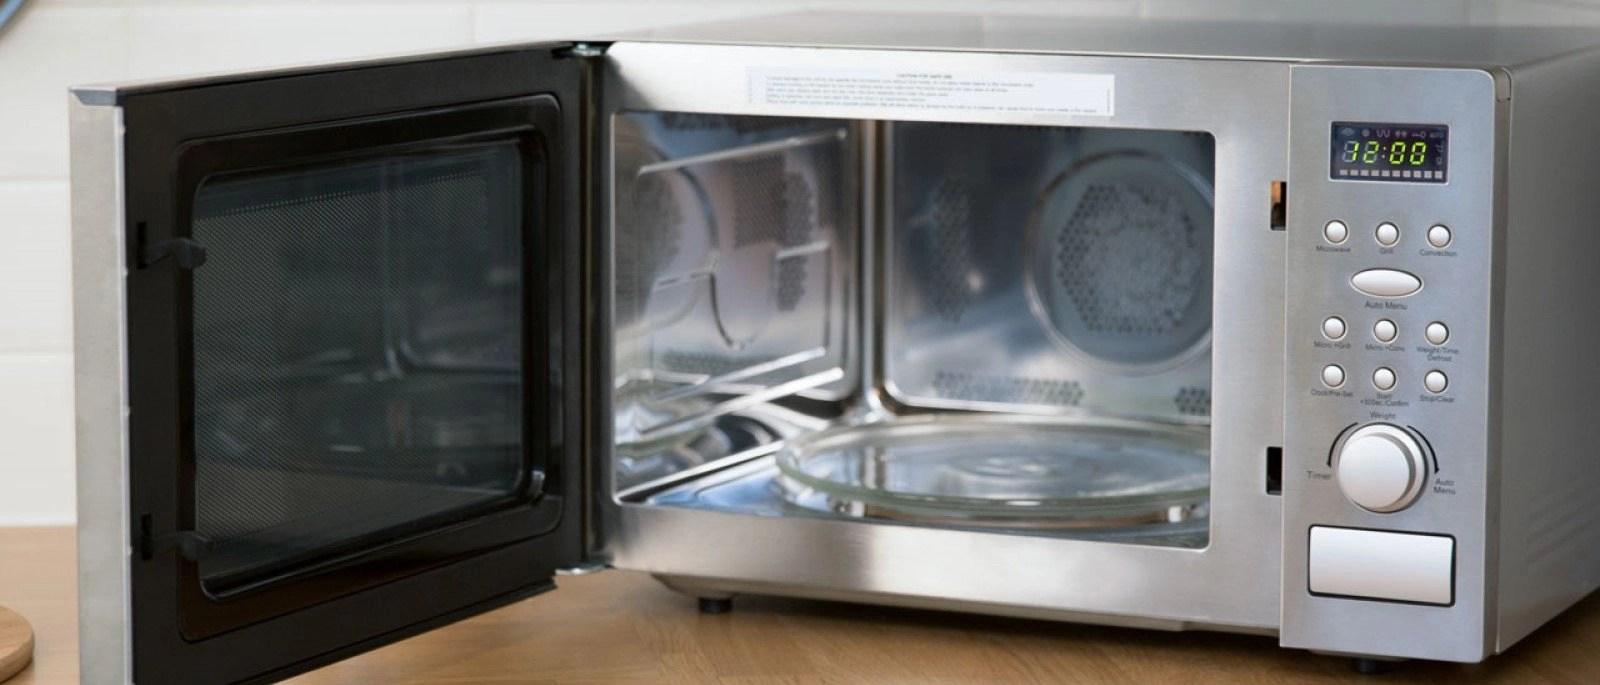 best 900 watt microwaves review for